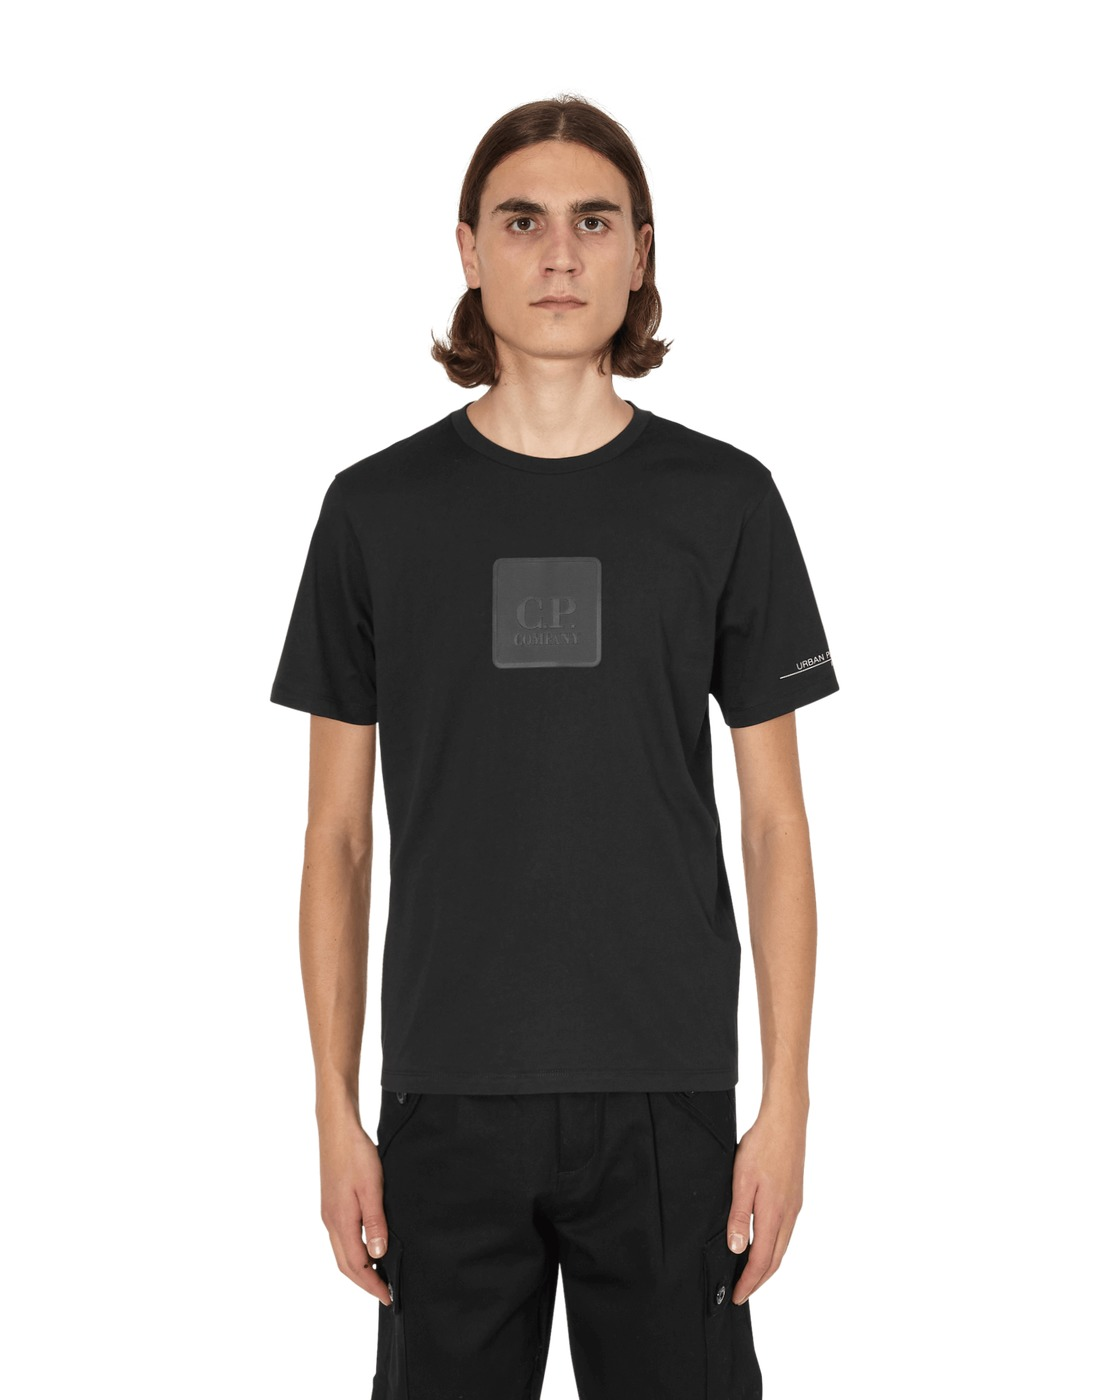 C.P. Company Jersey 30/1 Logo Plaque T Shirt Black